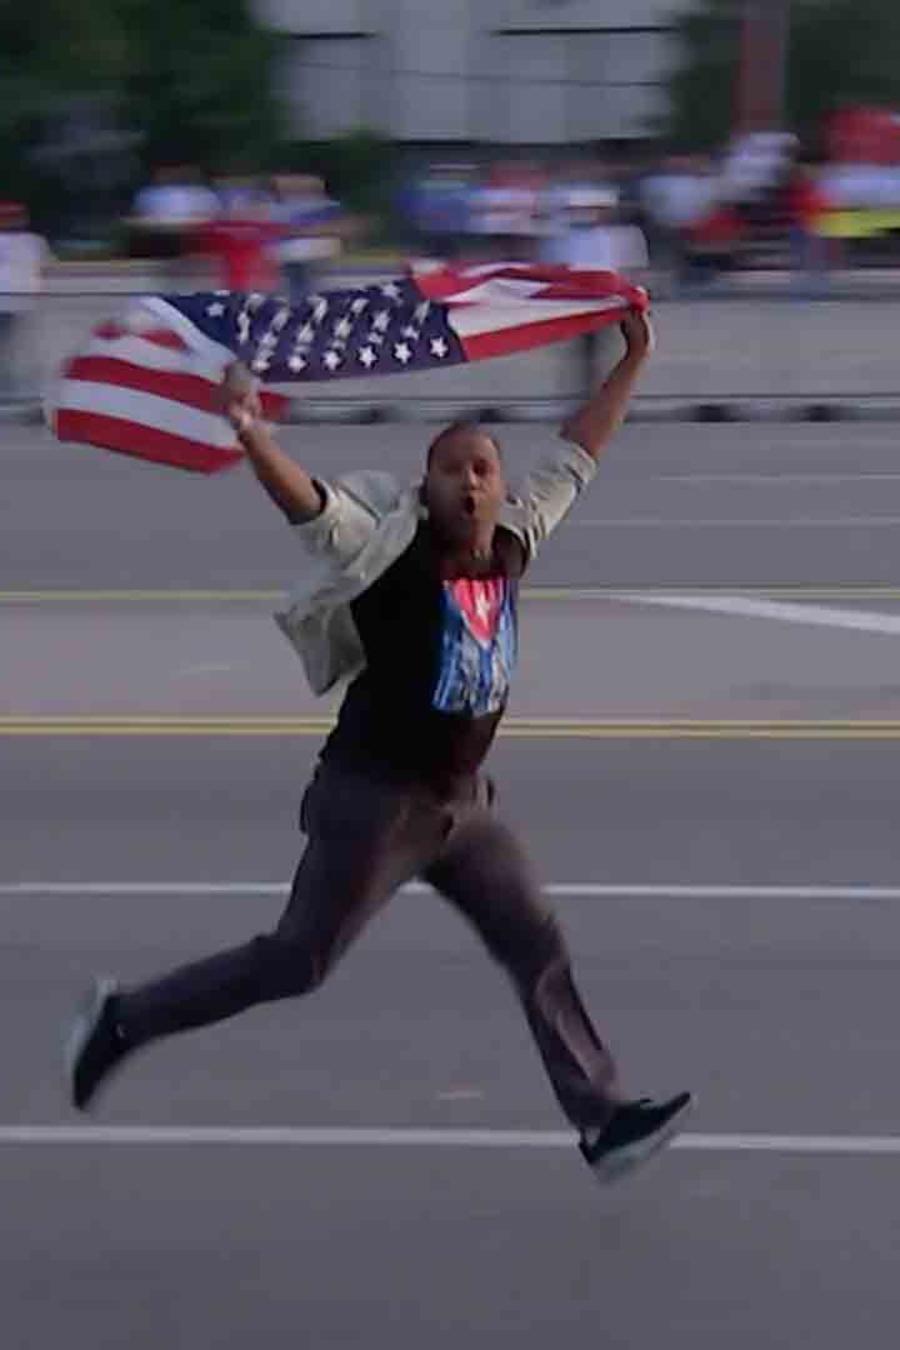 Cubano Bandera